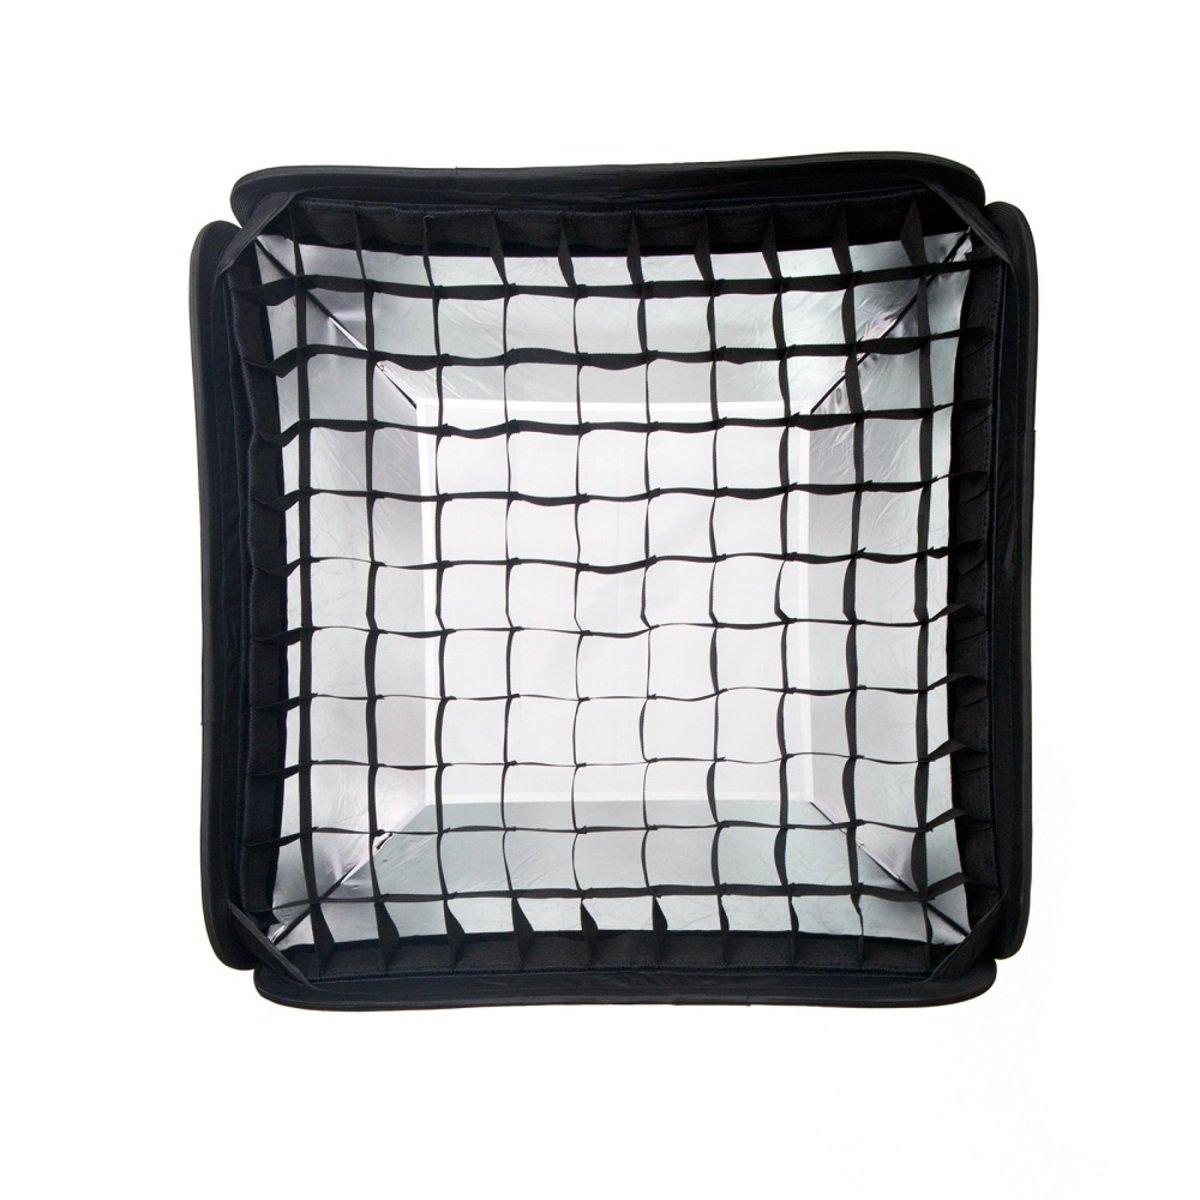 CB-60S 60cm 可摺疊黑色/銀色柔光箱連蜂巢網